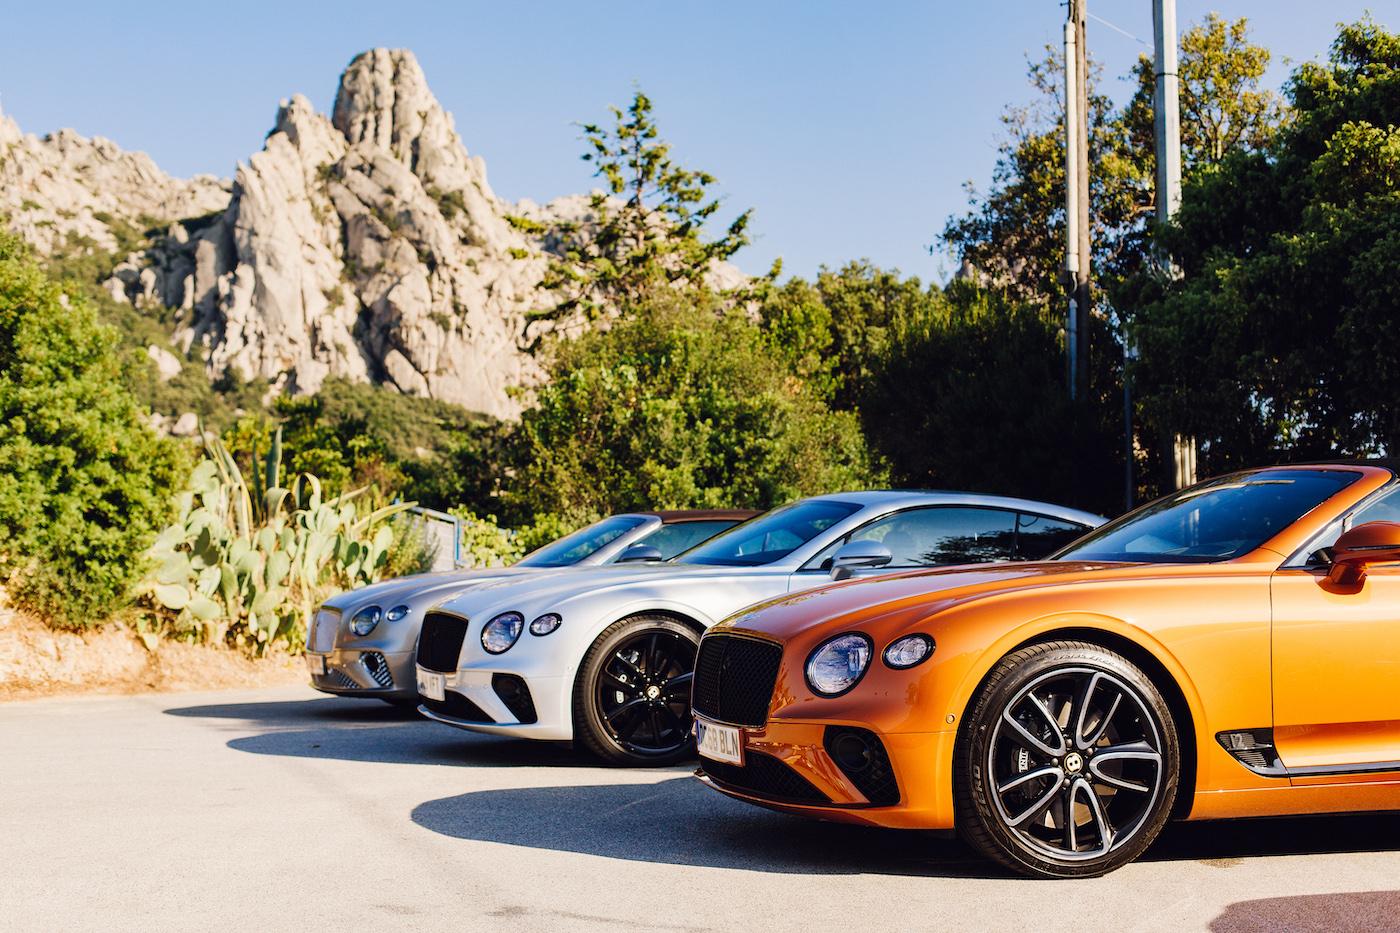 Mit Bentley in Porto Cervo: Die Bentley Summer Tour 2019